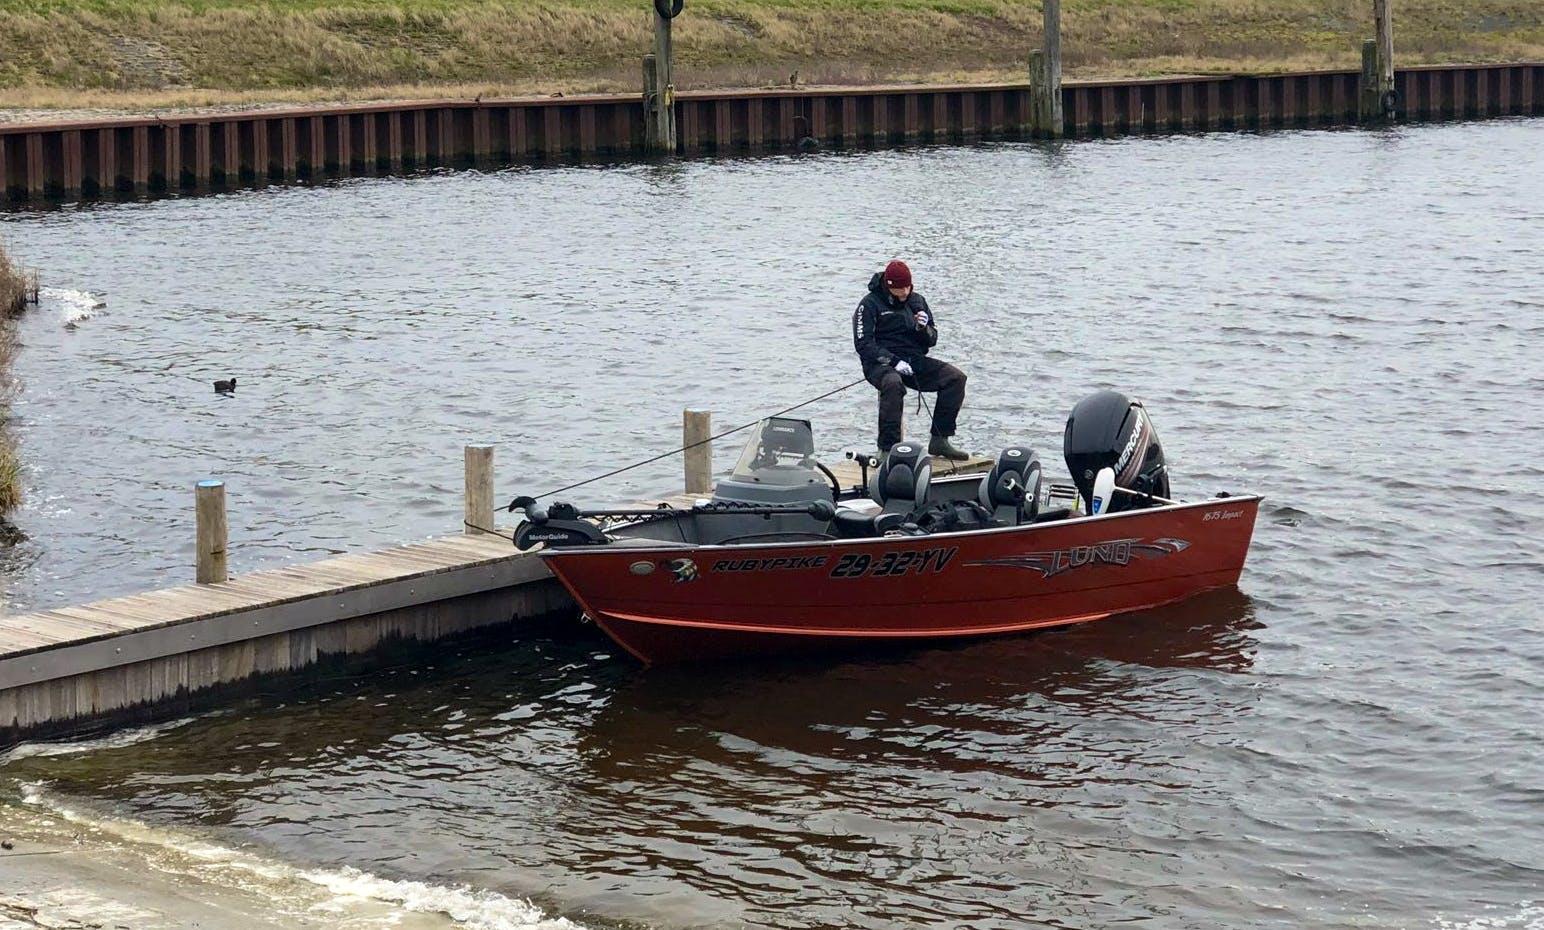 Enjoy Fishing in the Netherlands (Volkerak, Haringvliet, Hollands Diep, Veluwemeer) on the RubyPike : Lund Impact SS 1675 BassBoat